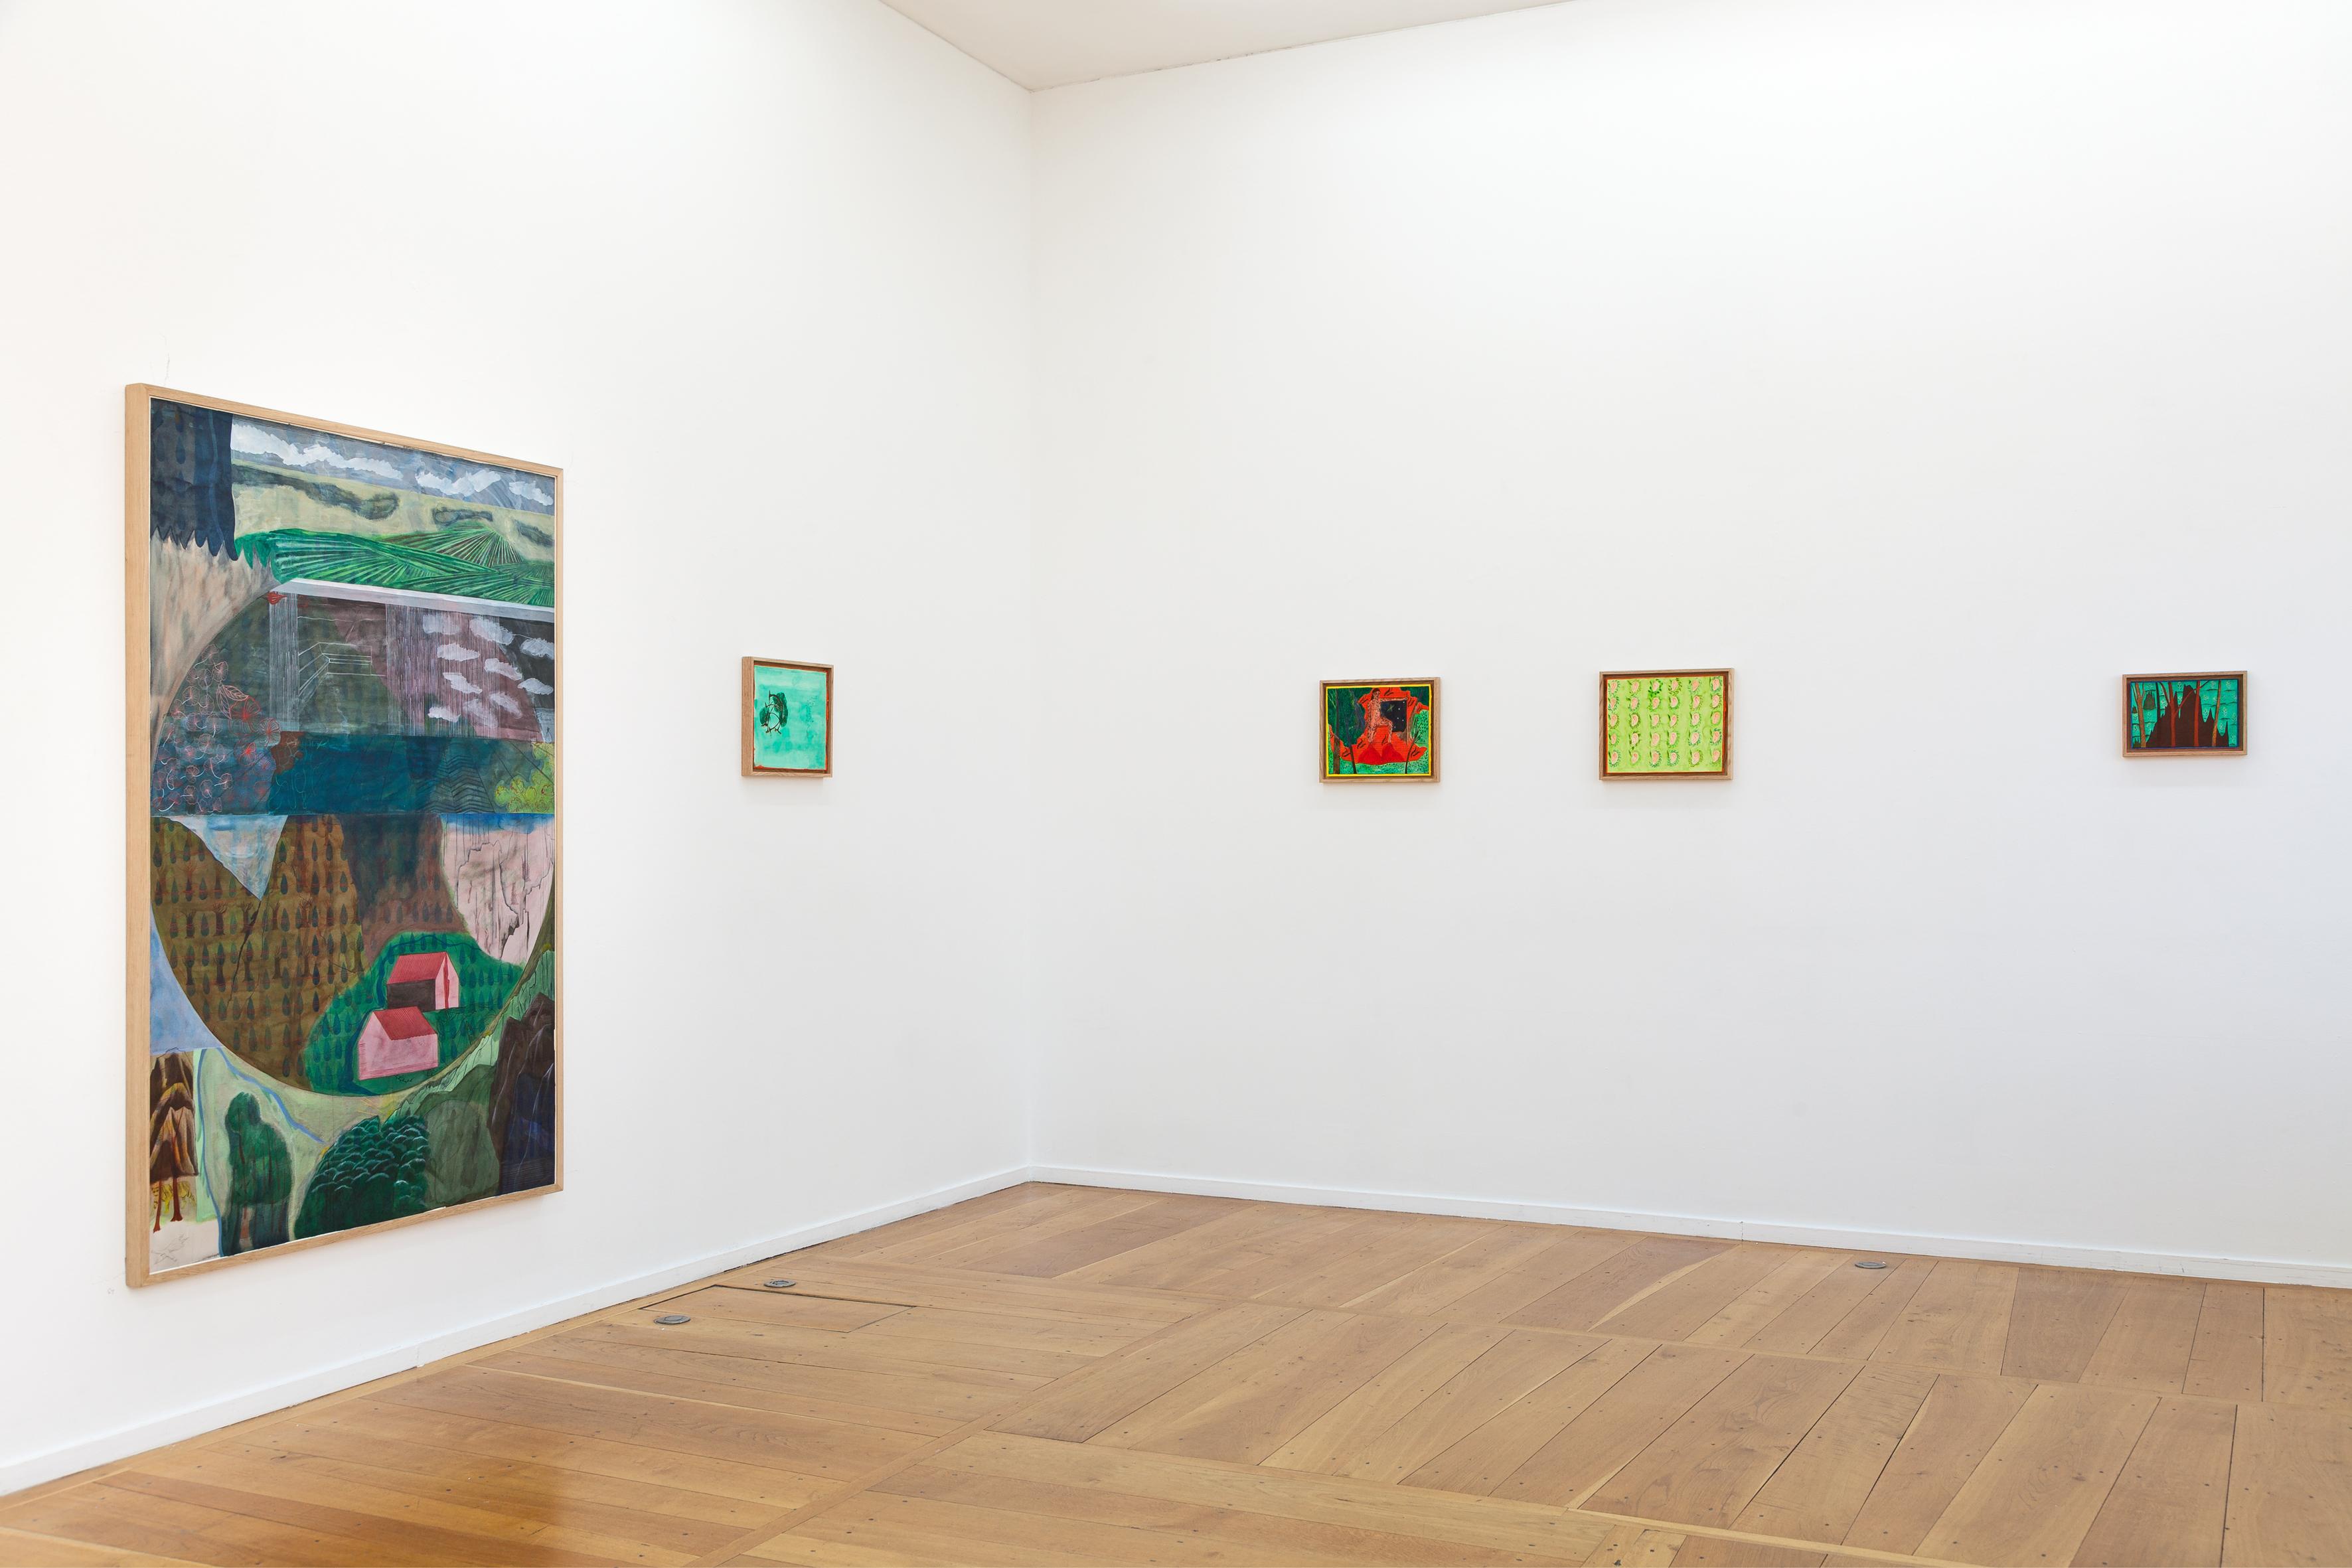 Karishma D'Souza, « Invocation », exhibition view, Xippas Paris, February 22 – July 11, 2020. Courtesy of the artist and Xippas. Photo: Fréderic Lanternier.